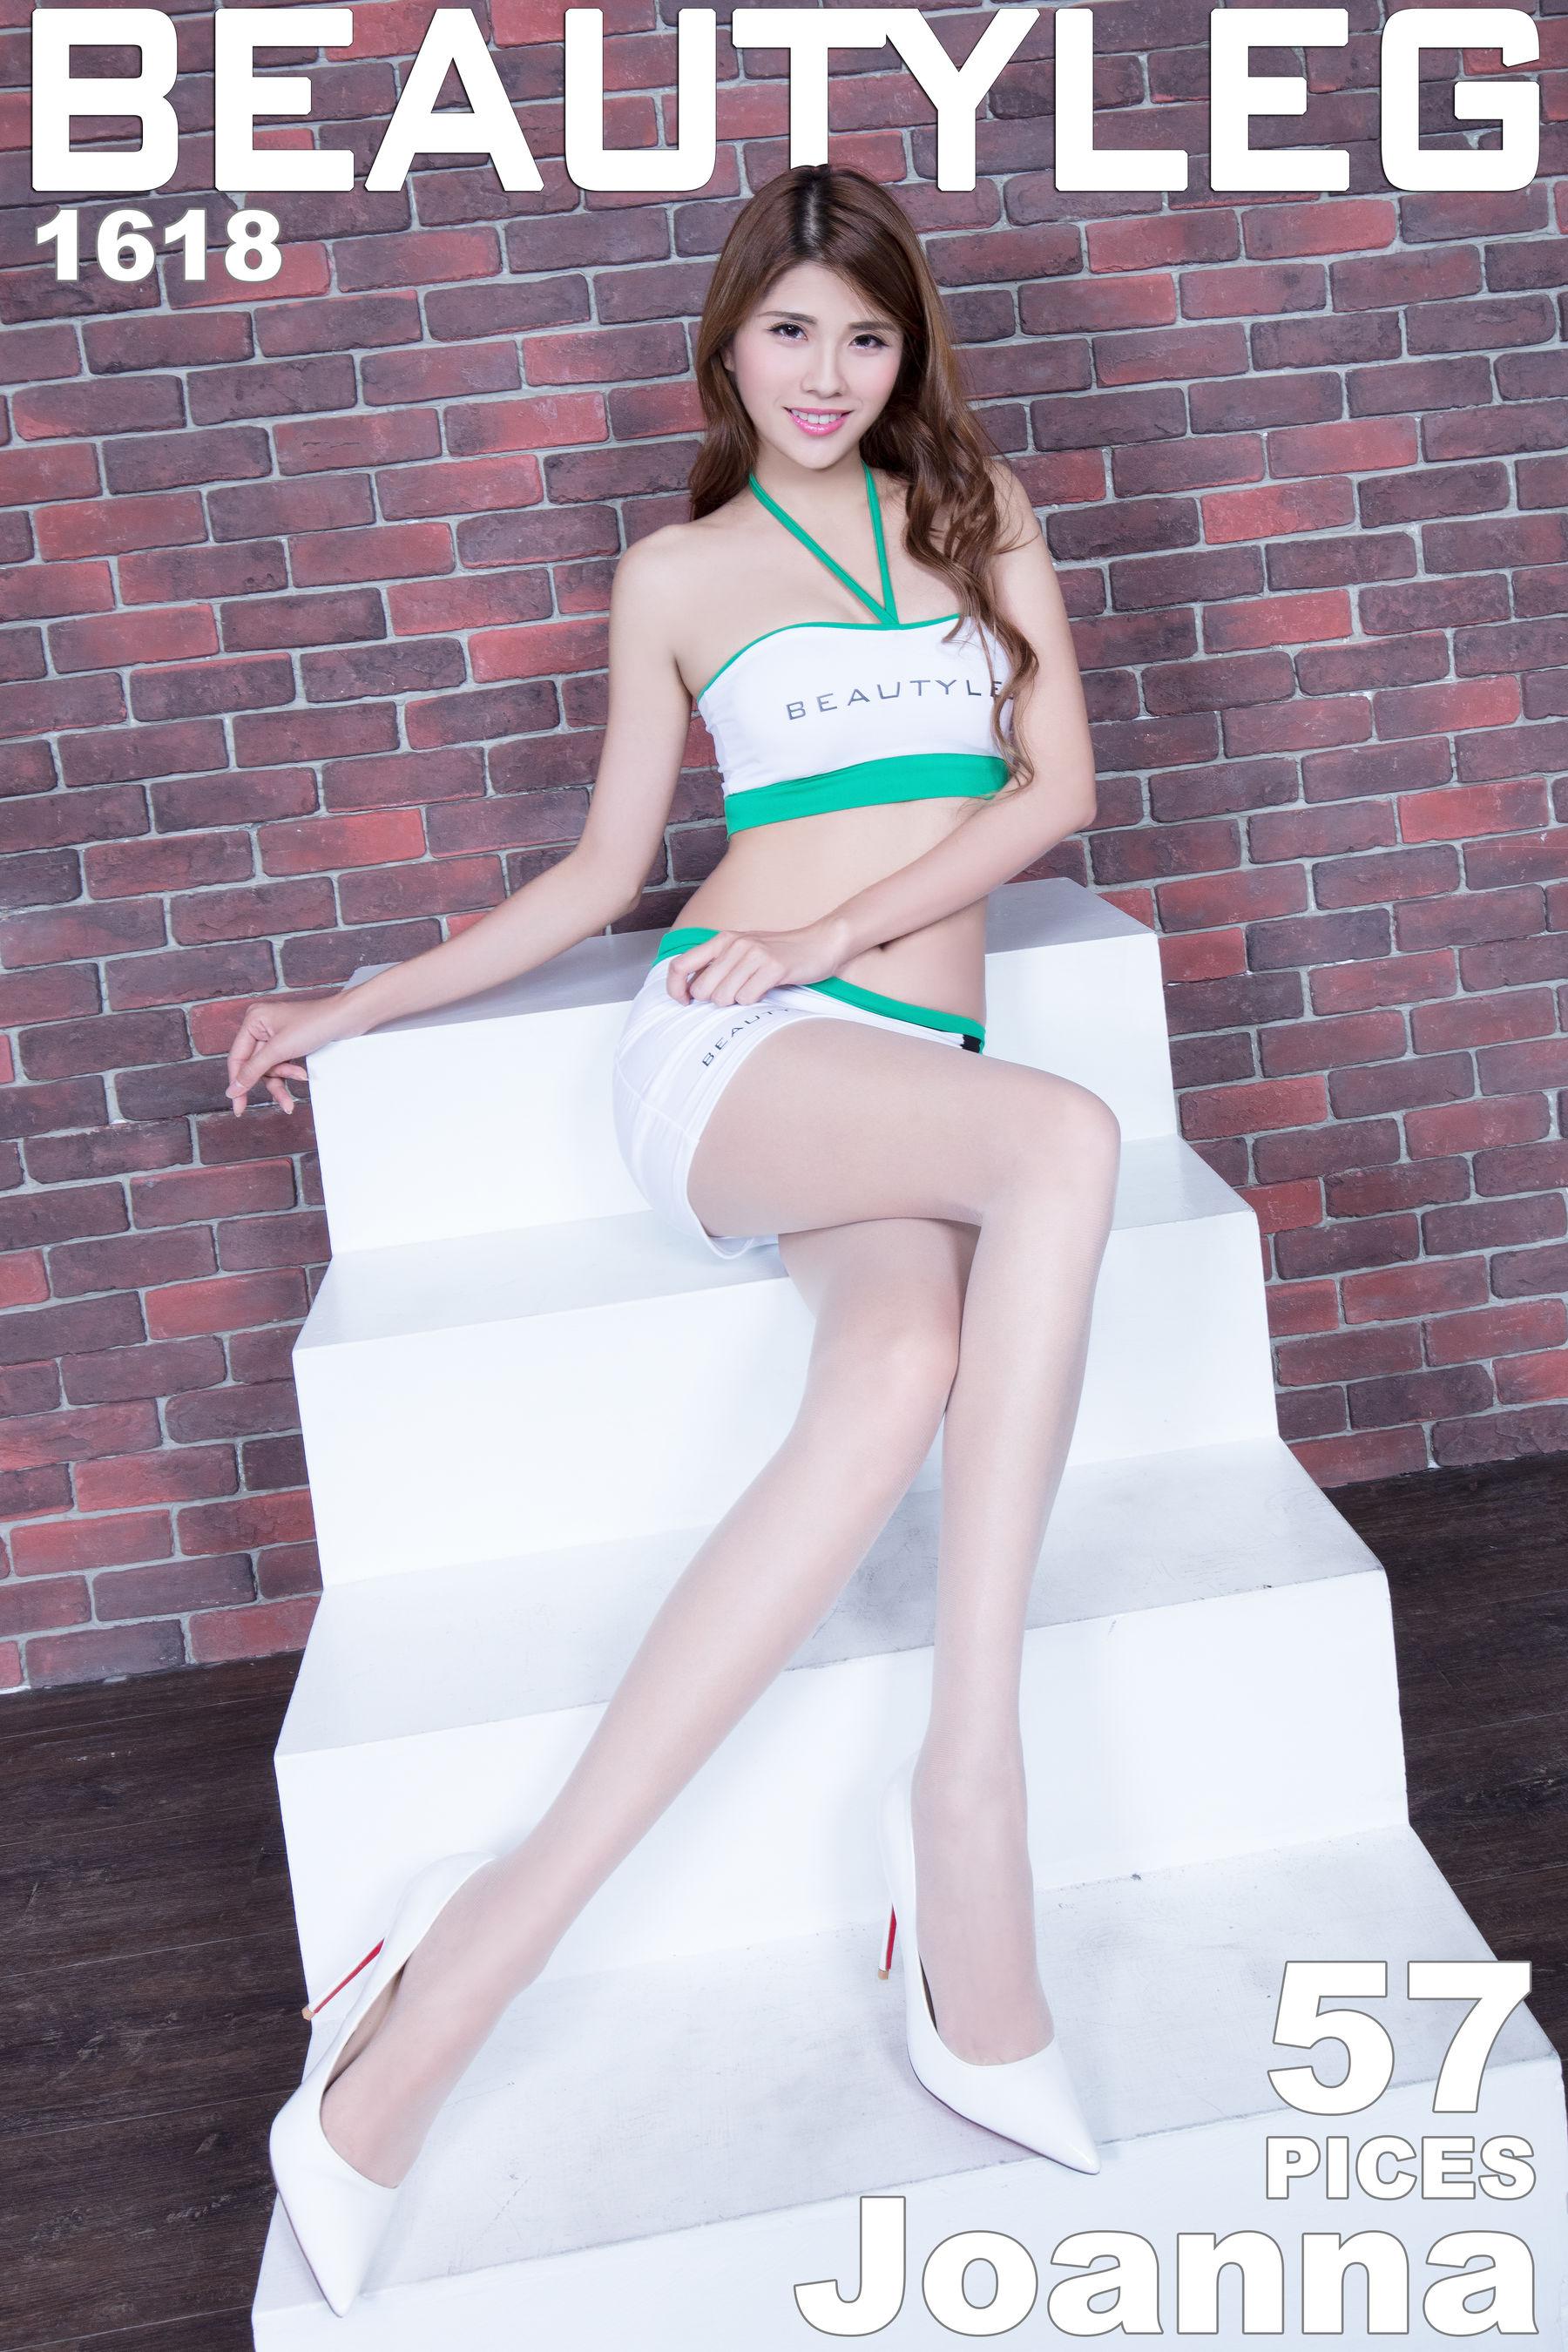 VOL.1292 [Beautyleg]高跟长腿美女:腿模Joanna超高清个人性感漂亮大图(57P)